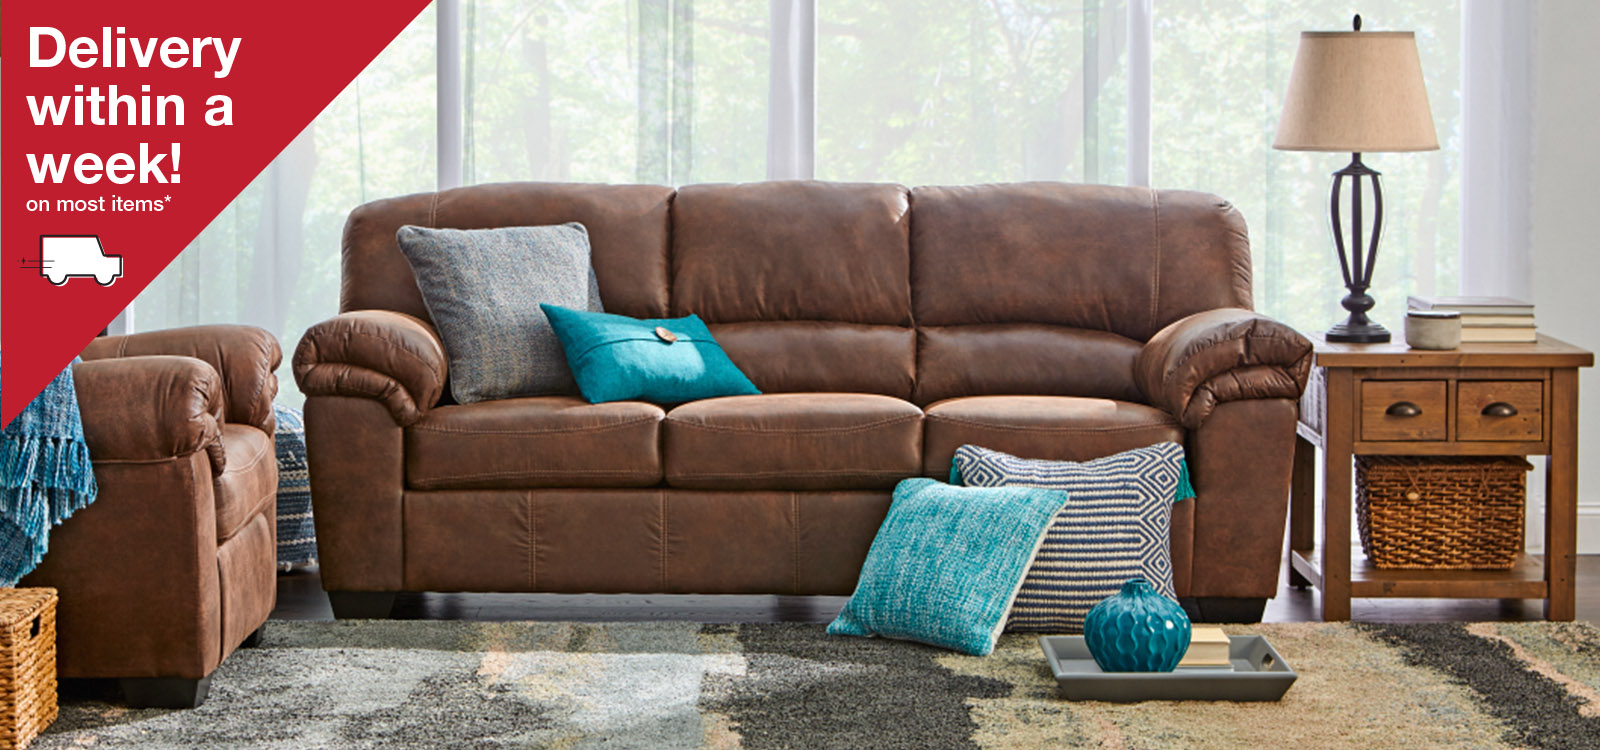 Stupendous Slumberland Online Store Slumberland Furniture Home Interior And Landscaping Spoatsignezvosmurscom